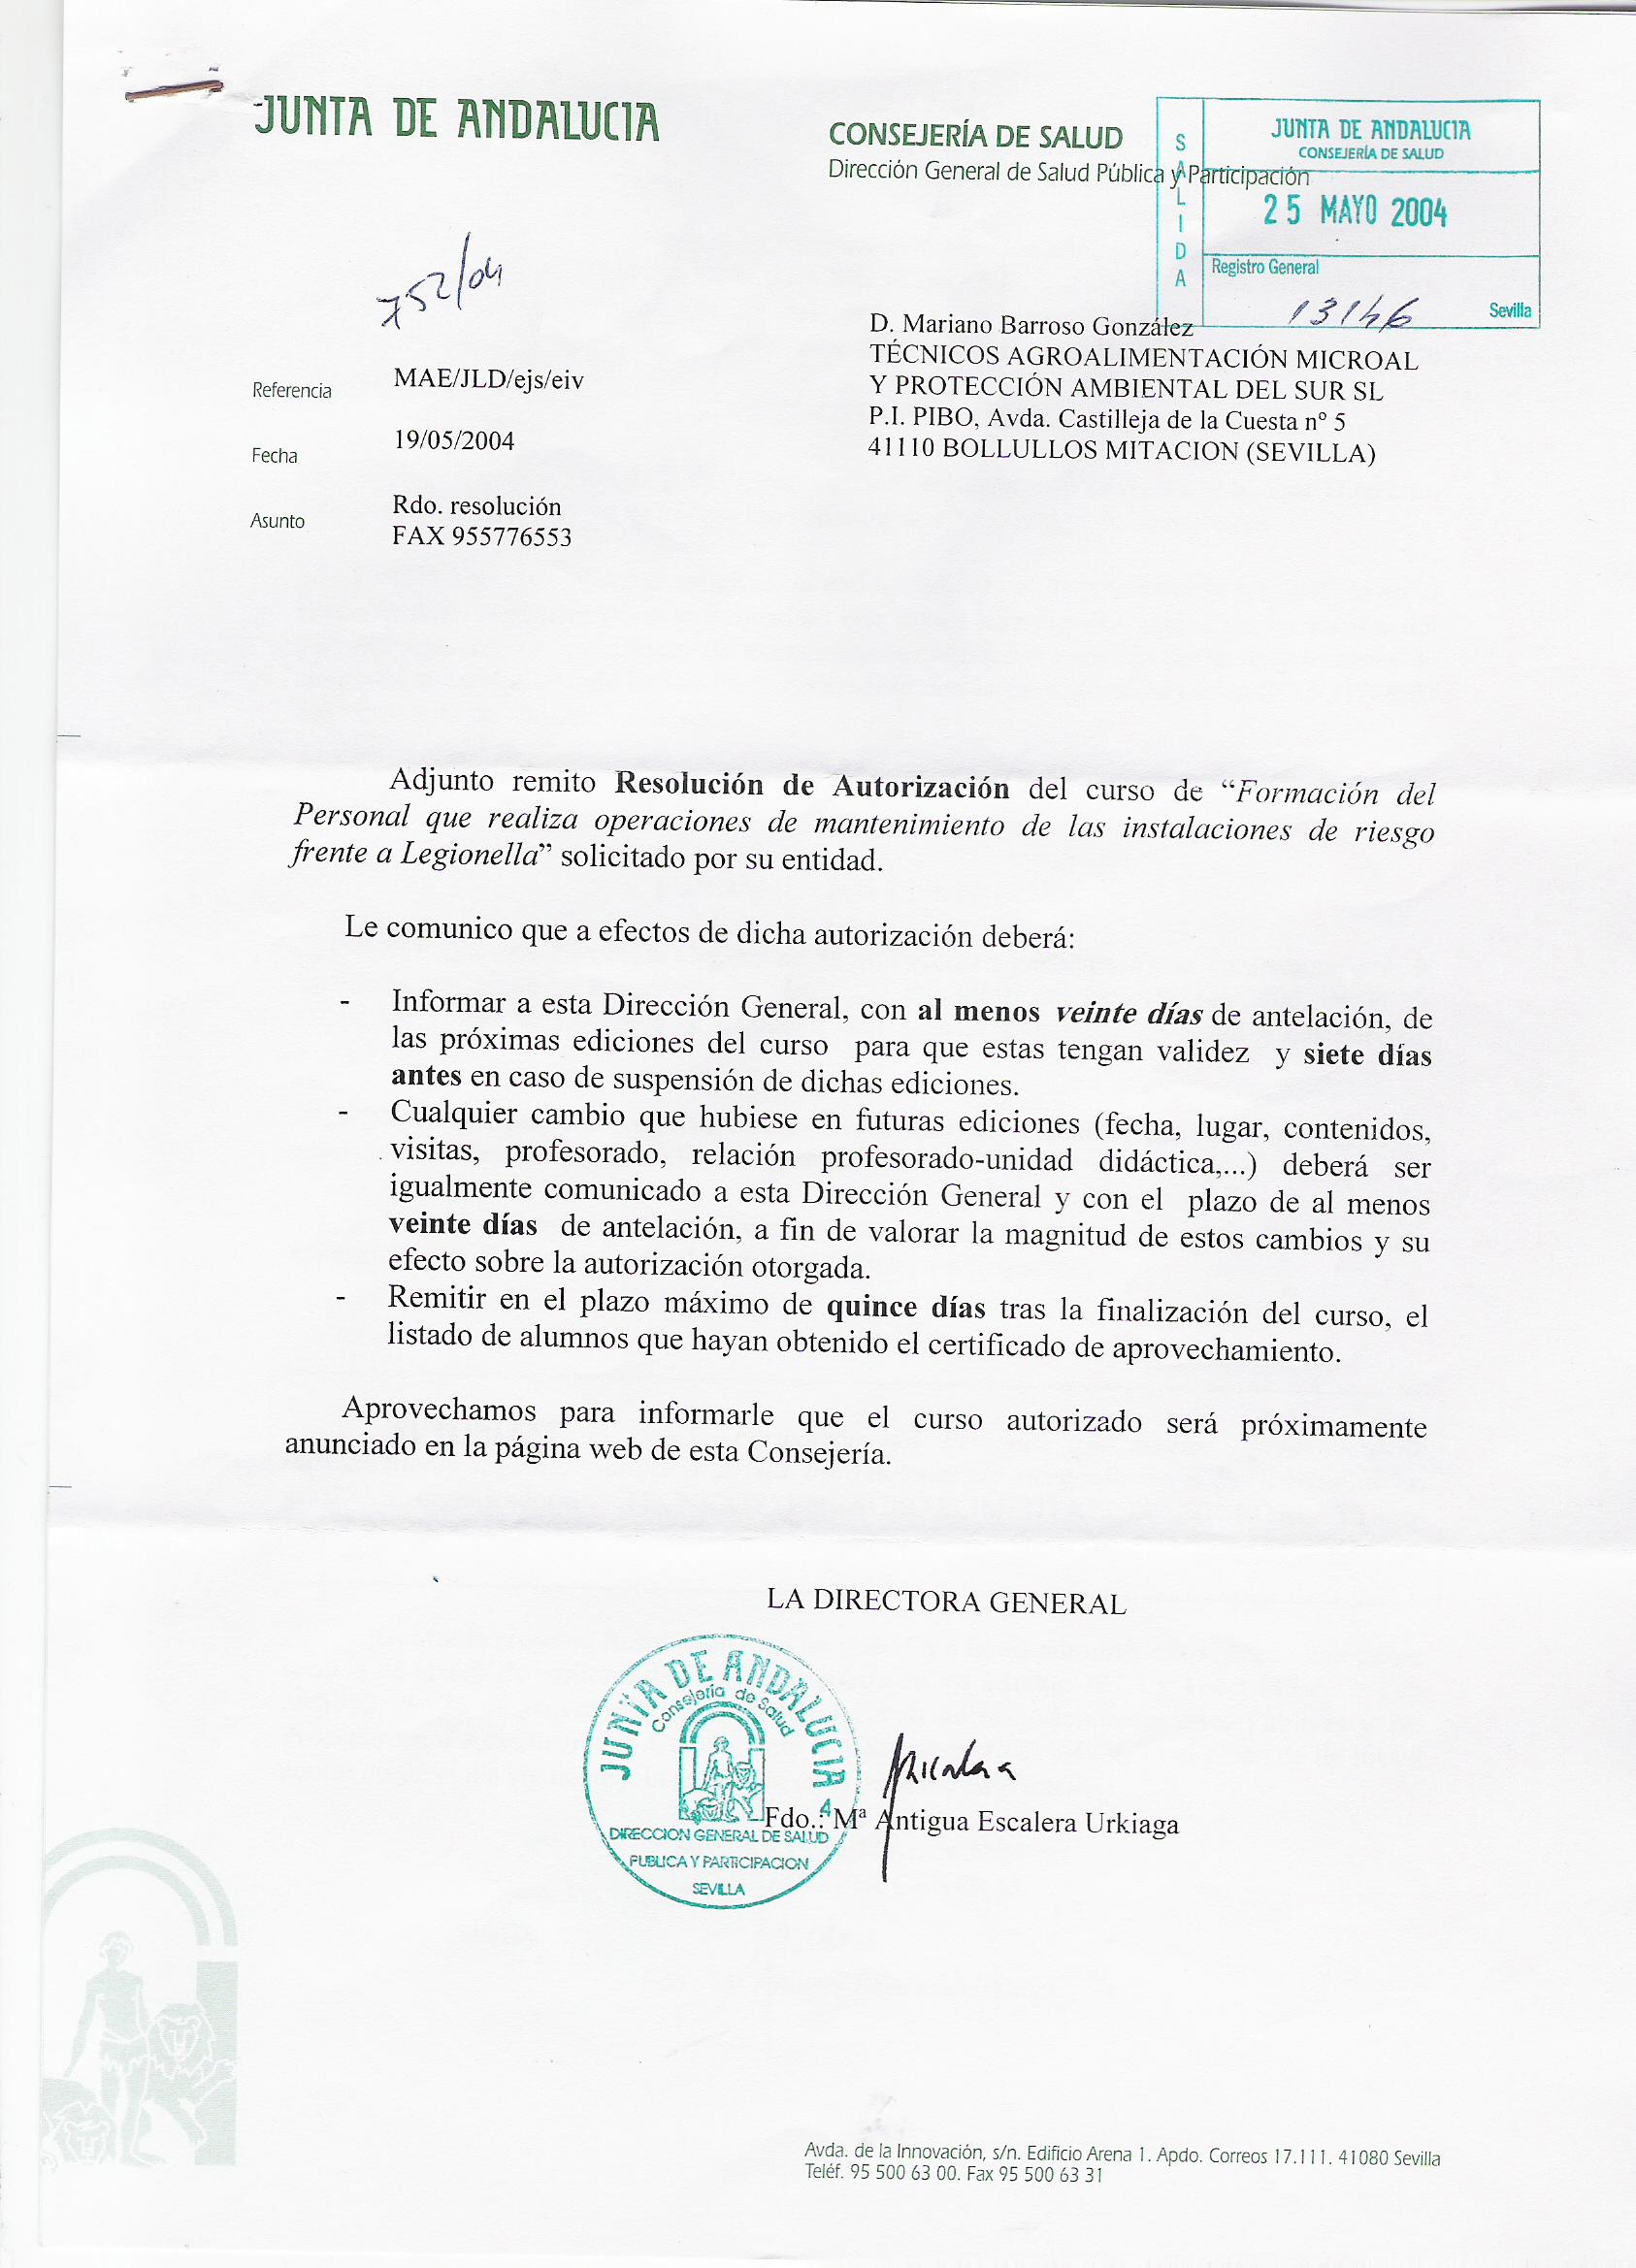 Acreditaciones microal for Oficina junta de andalucia